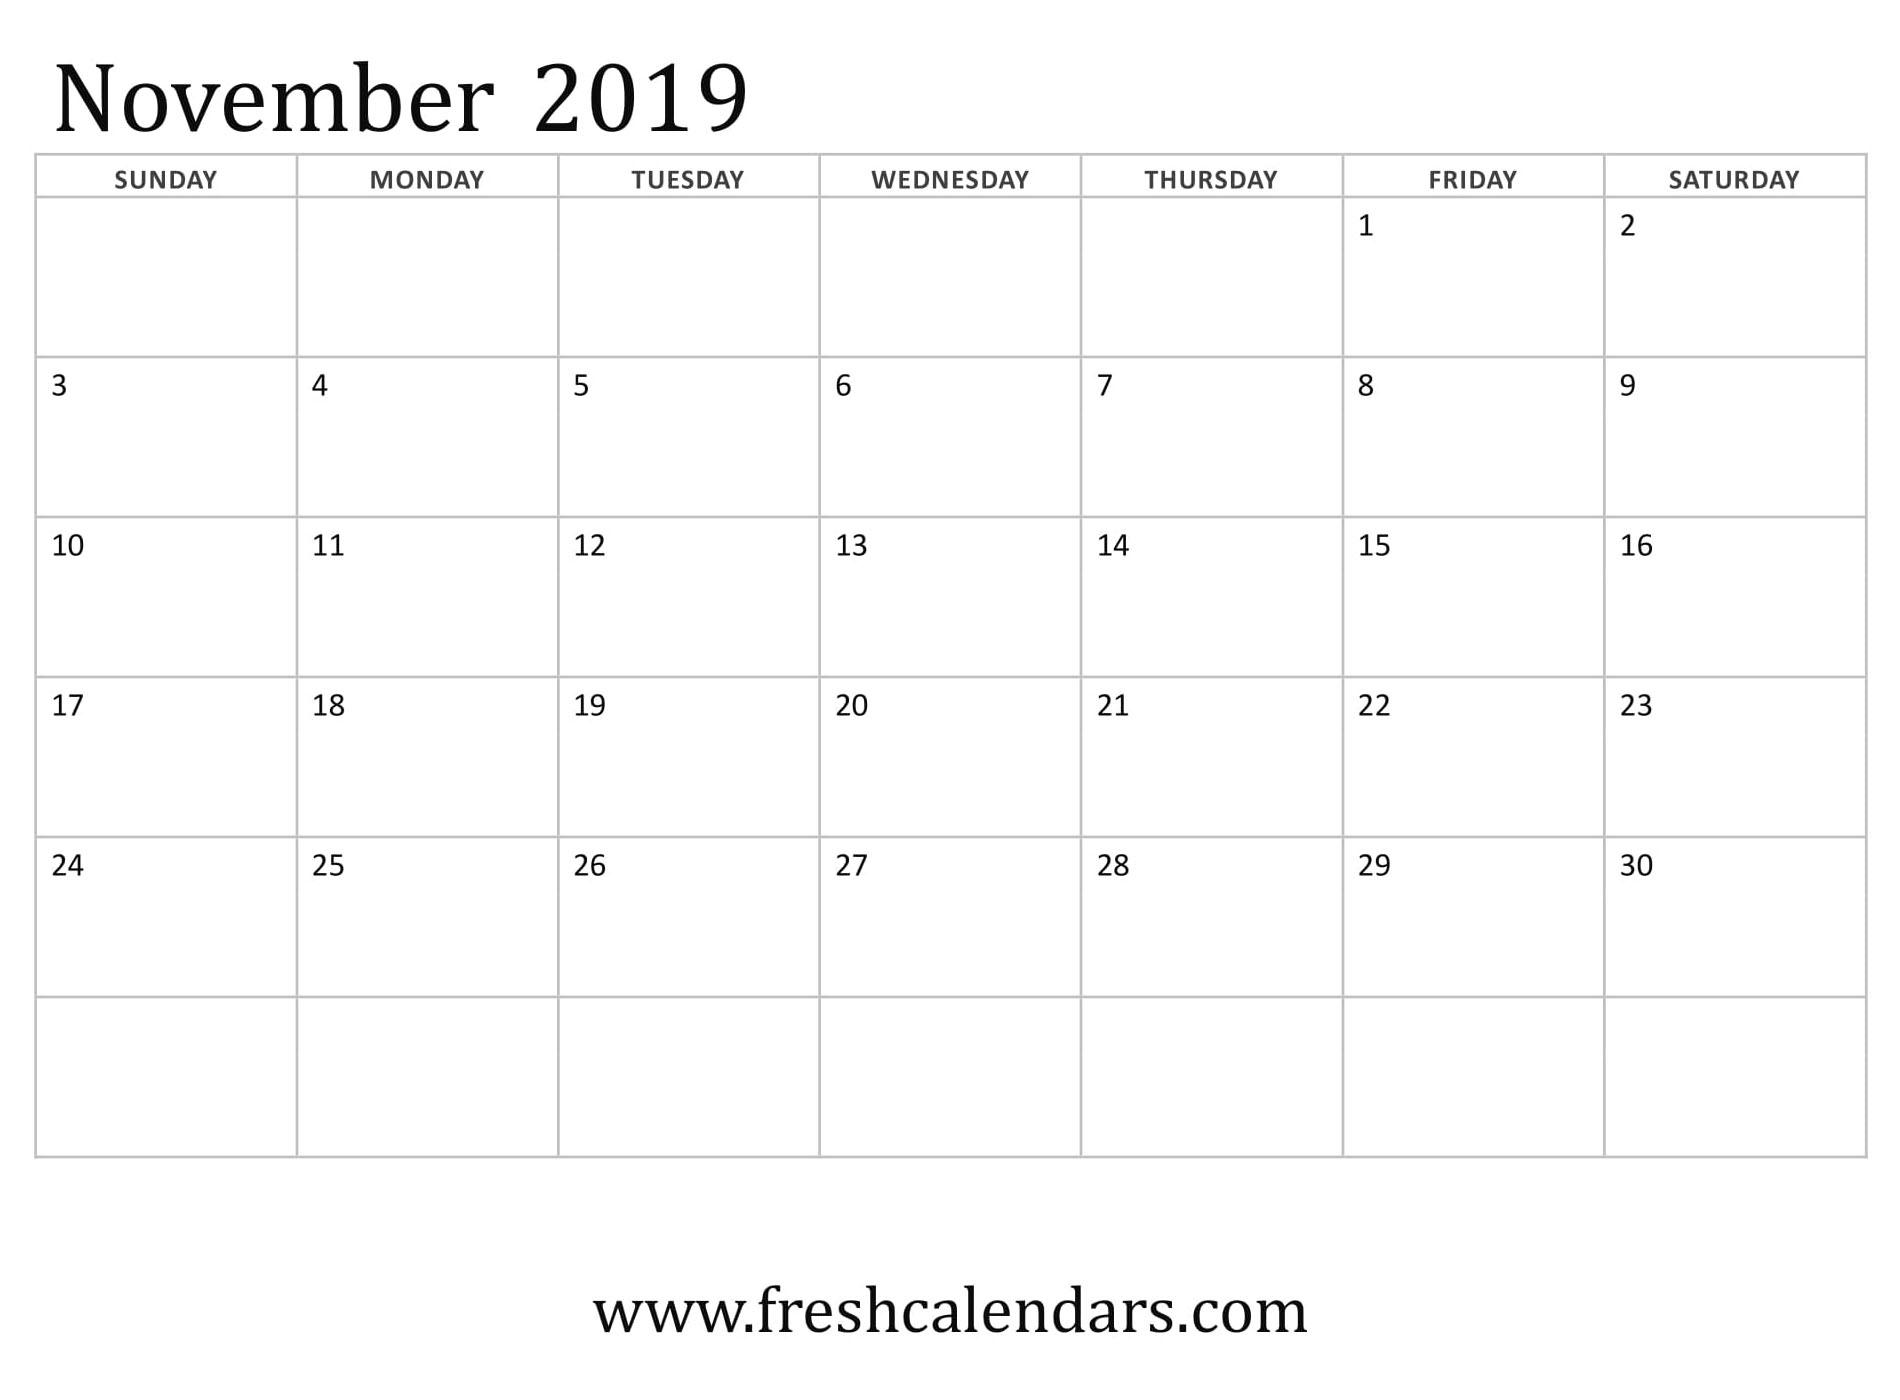 November 2019 Calendar Printable Fresh Calendars